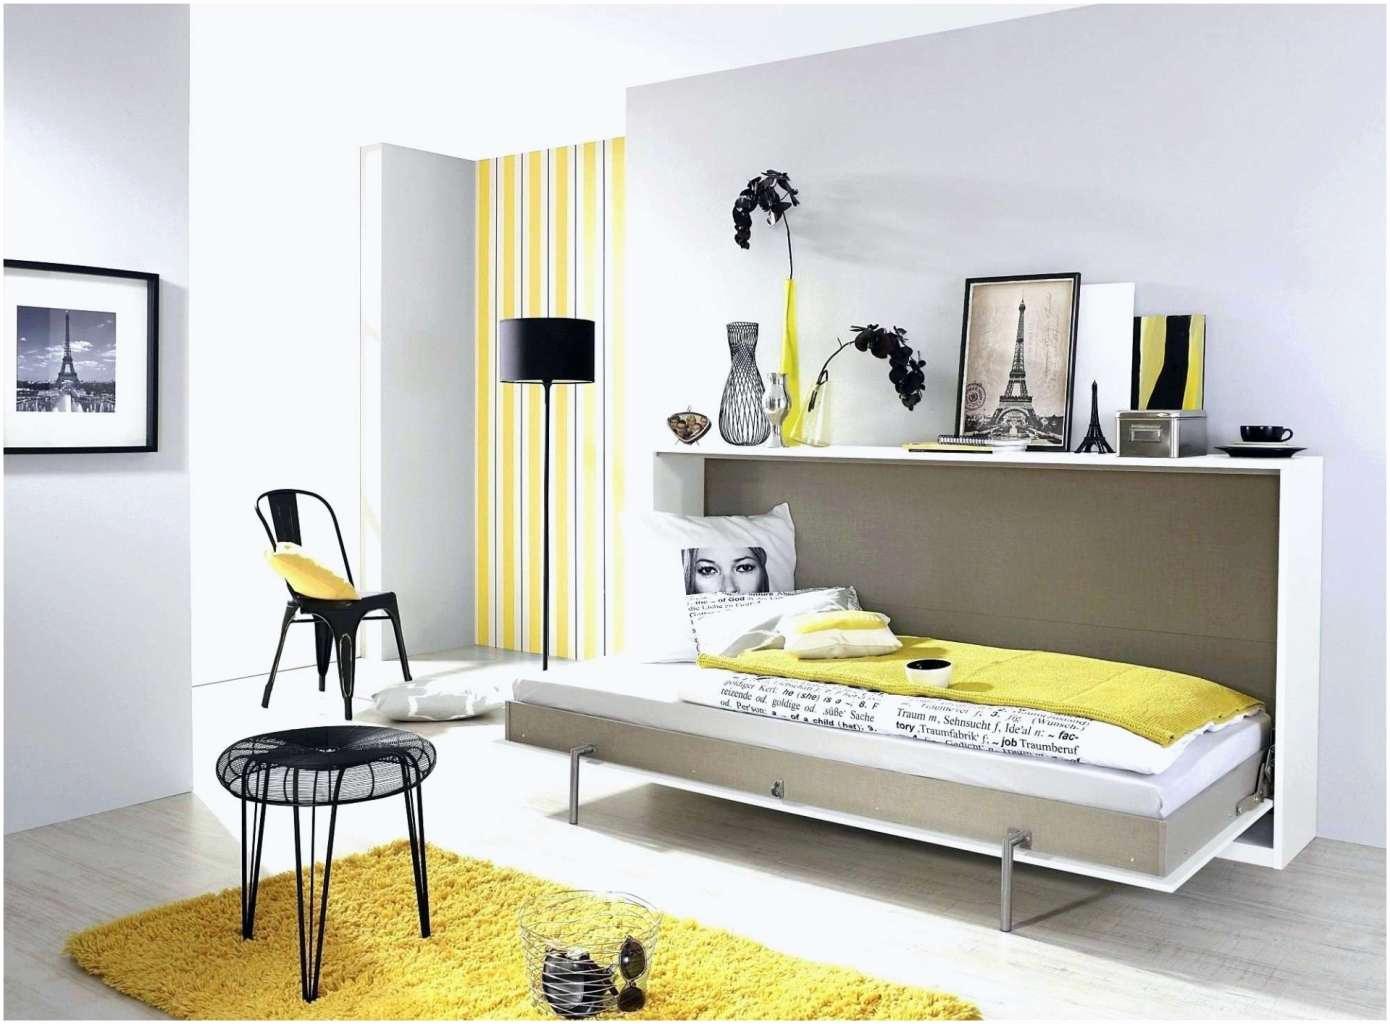 chambre d hote grenoble luxe location appartement de vacances grenoble levitraav of chambre d hote grenoble